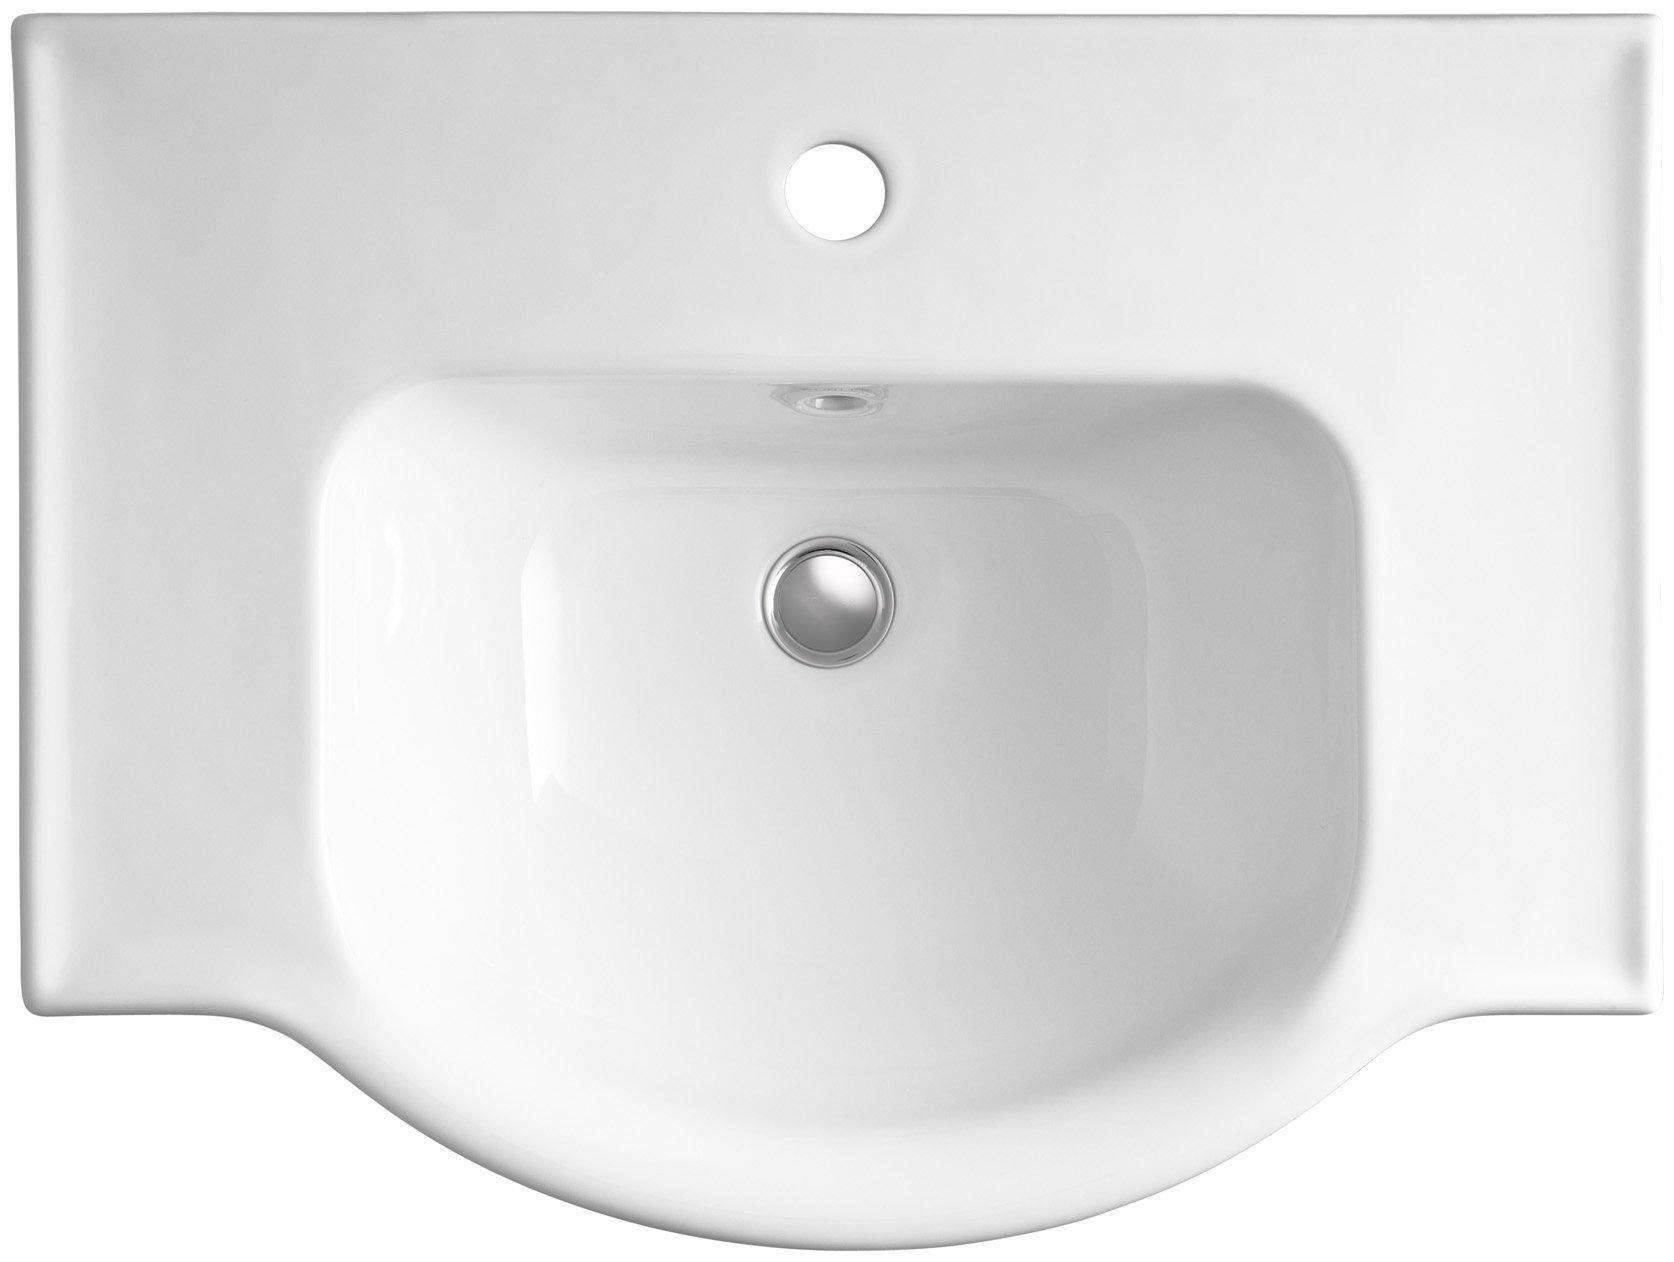 KOHLER K-5248-1-0 Veer Single-Hole Sink Basin, 24-Inch, White by Kohler (Image #2)